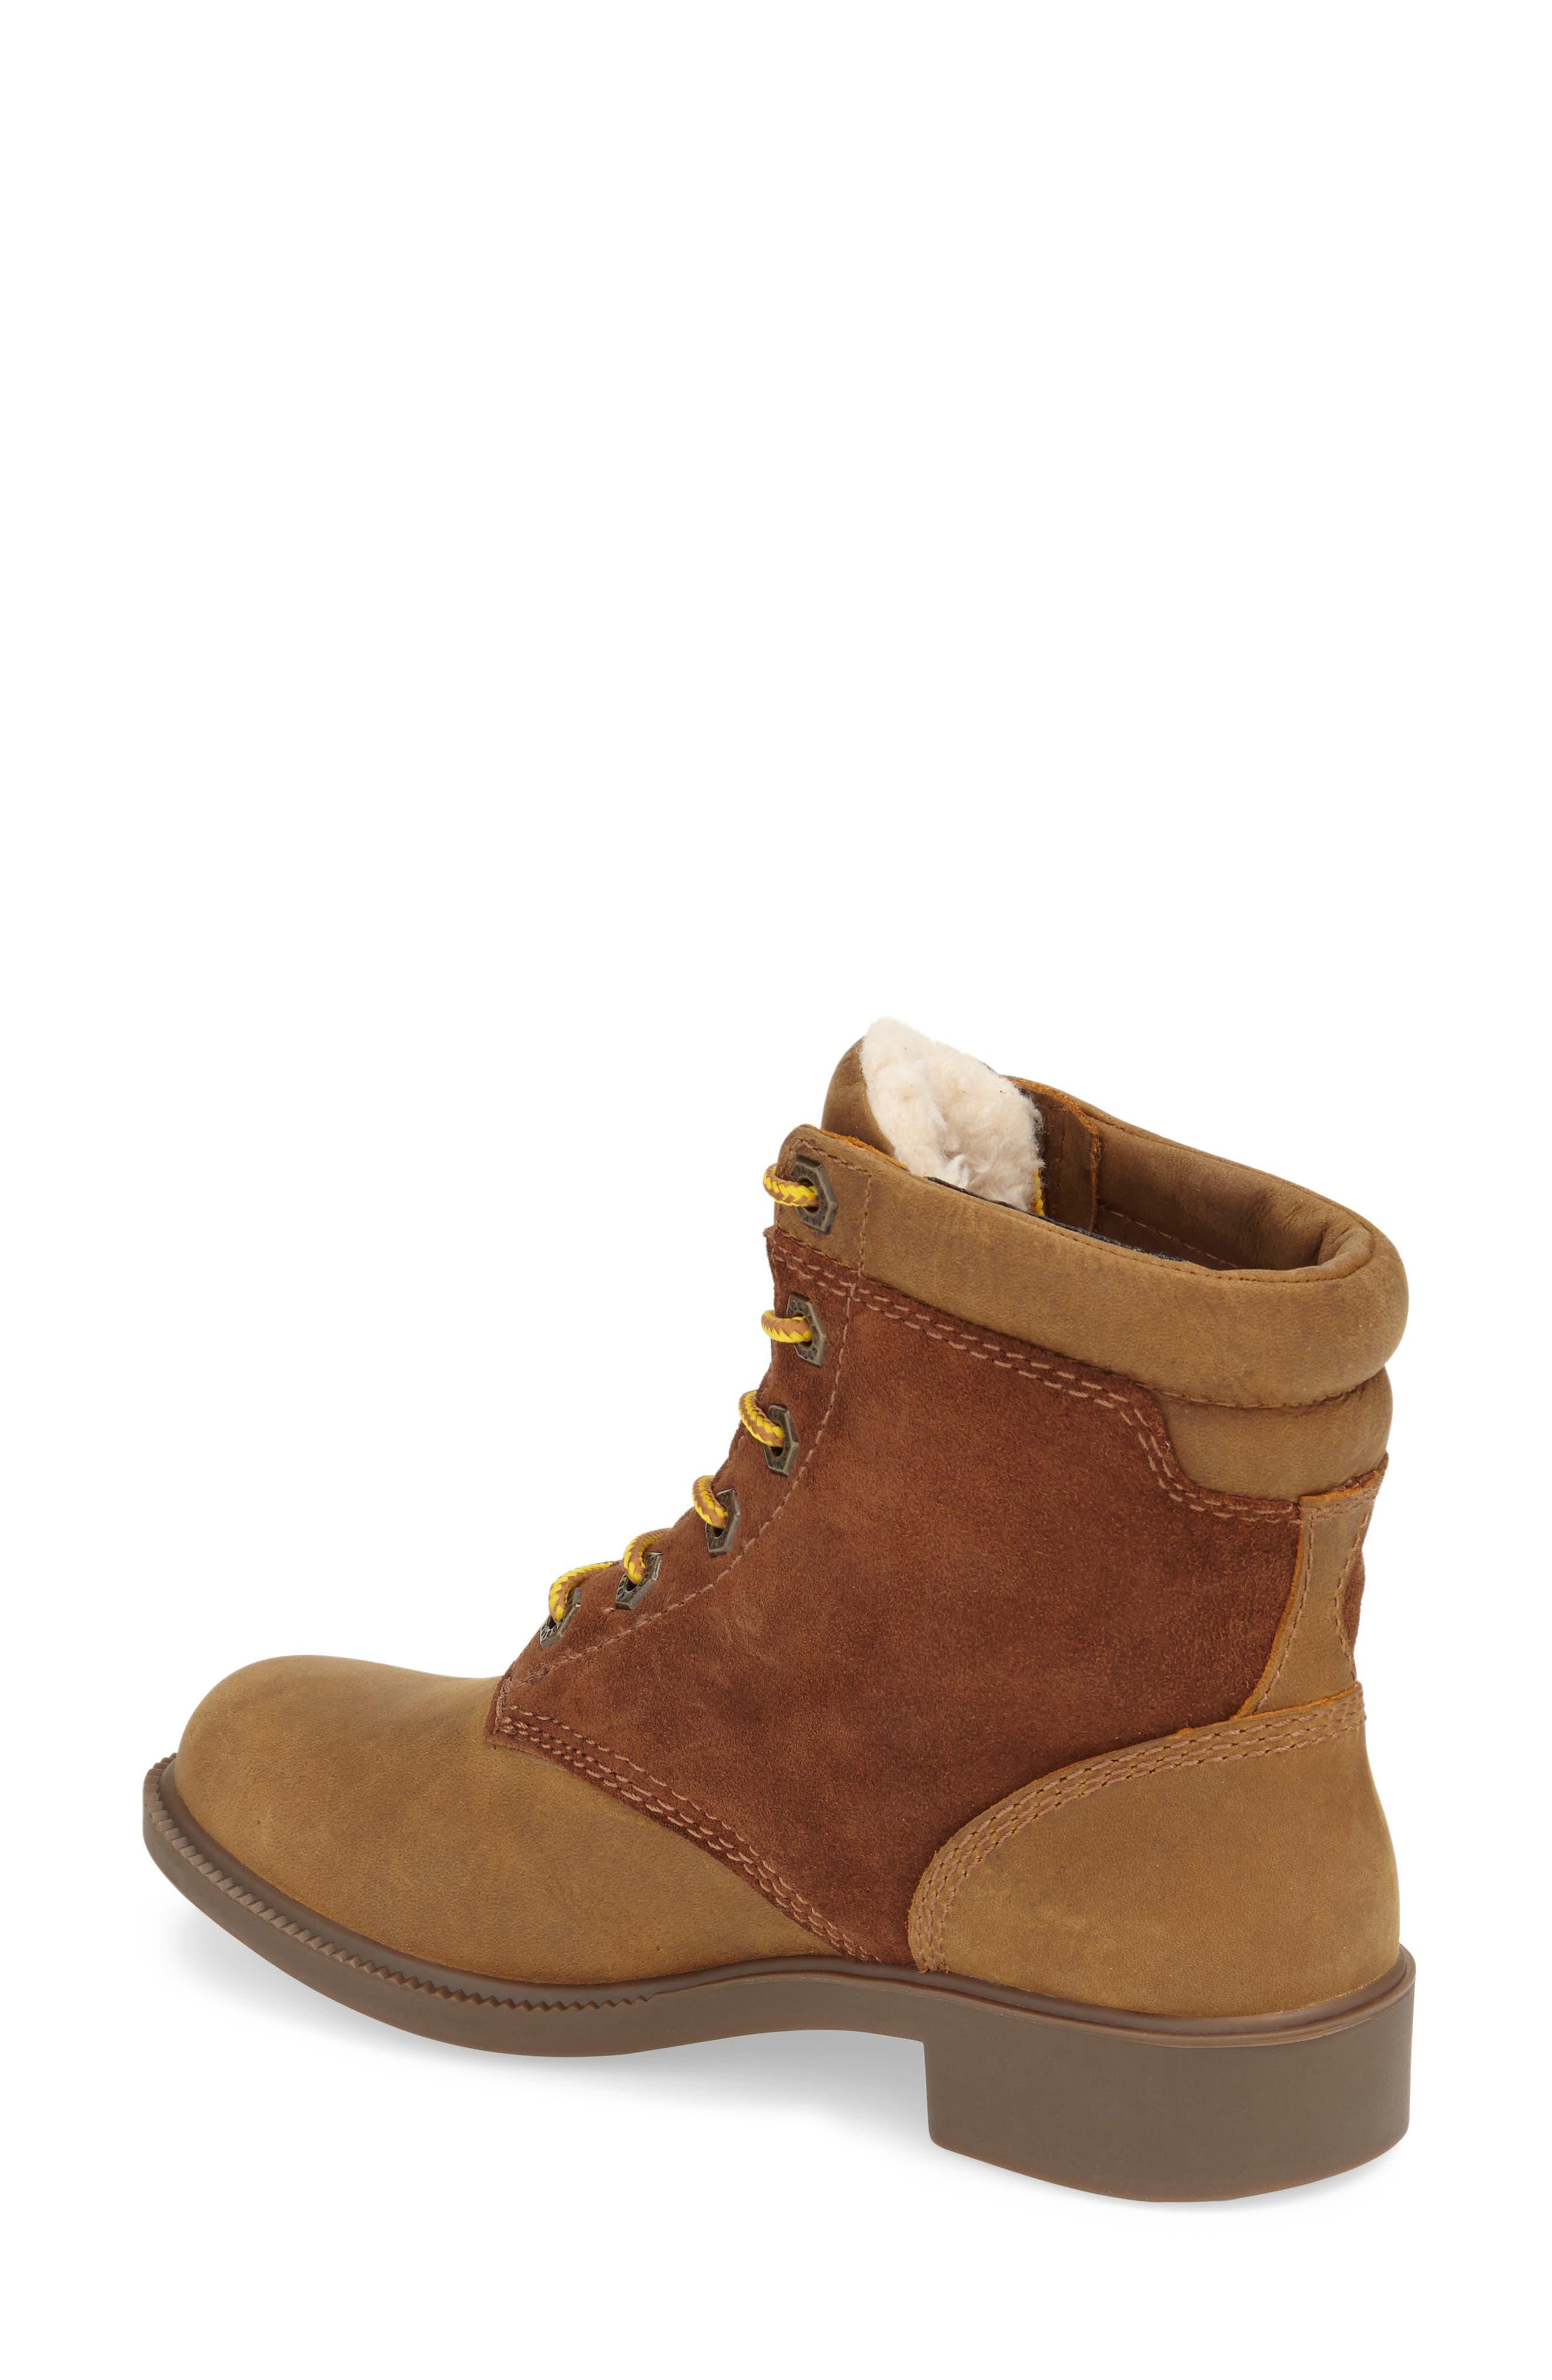 Alternate Image 2  - Kodiak Original Waterproof Fleece Boot (Women)